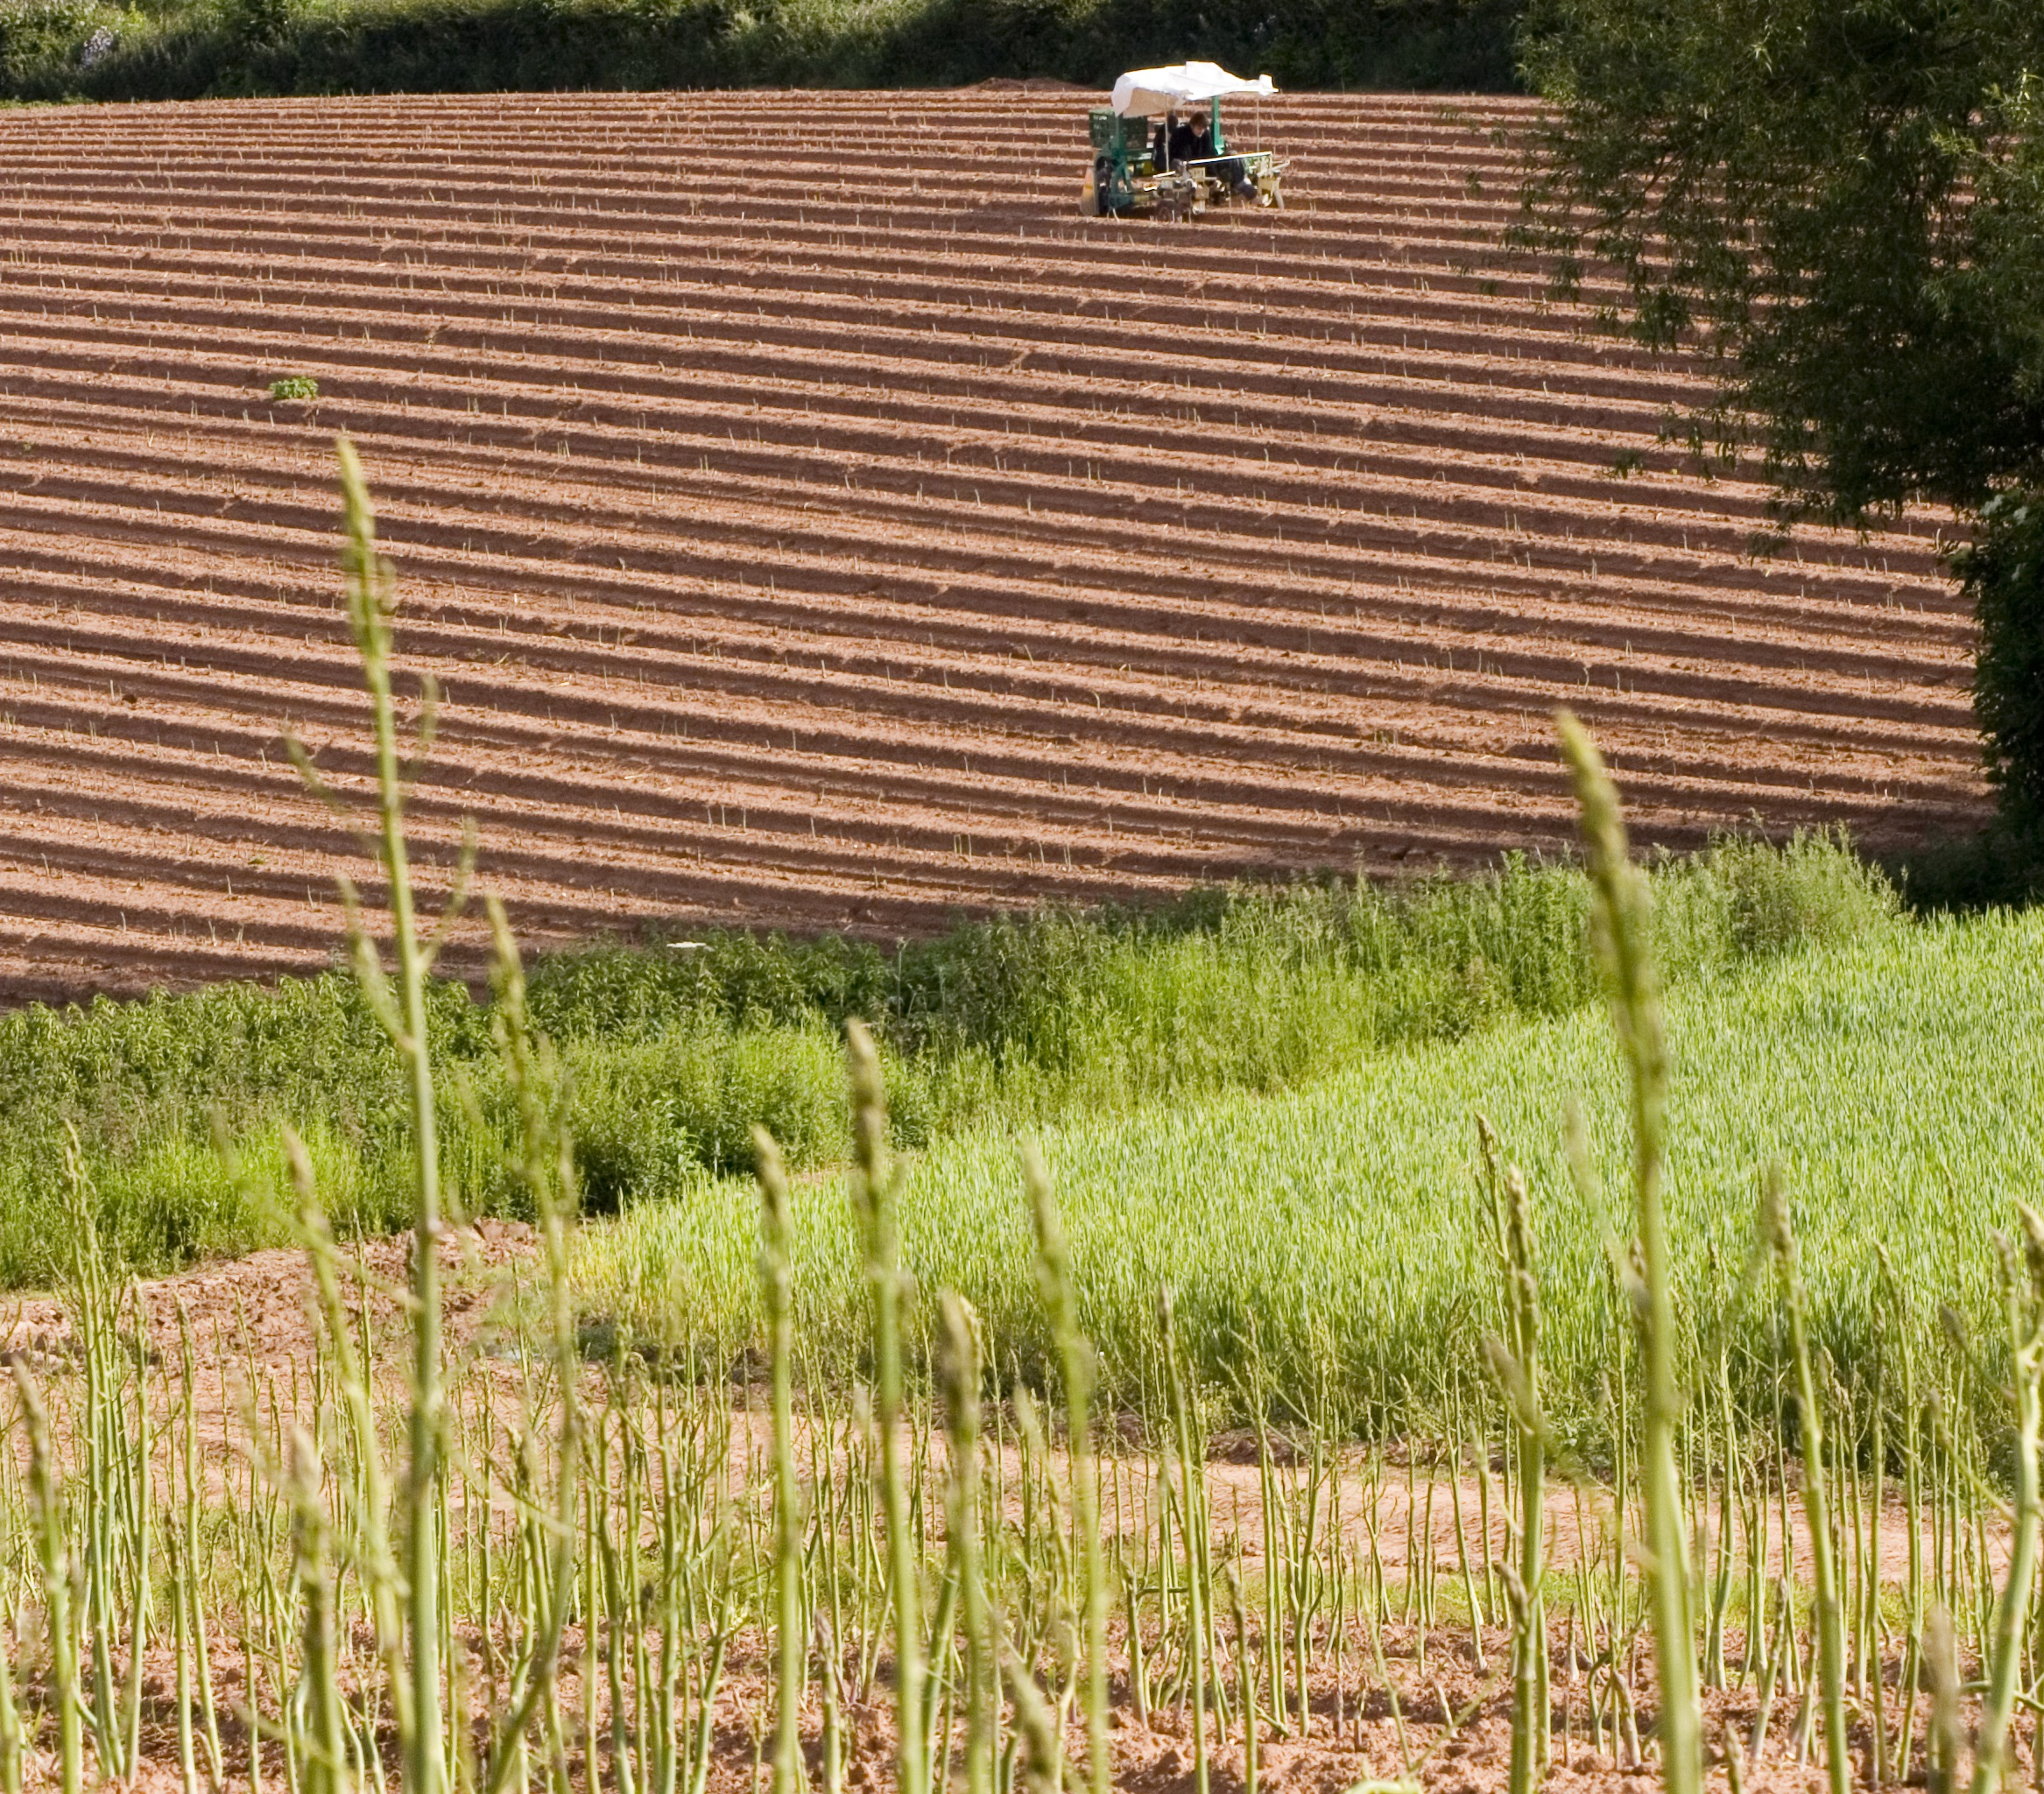 Asparagus in Field